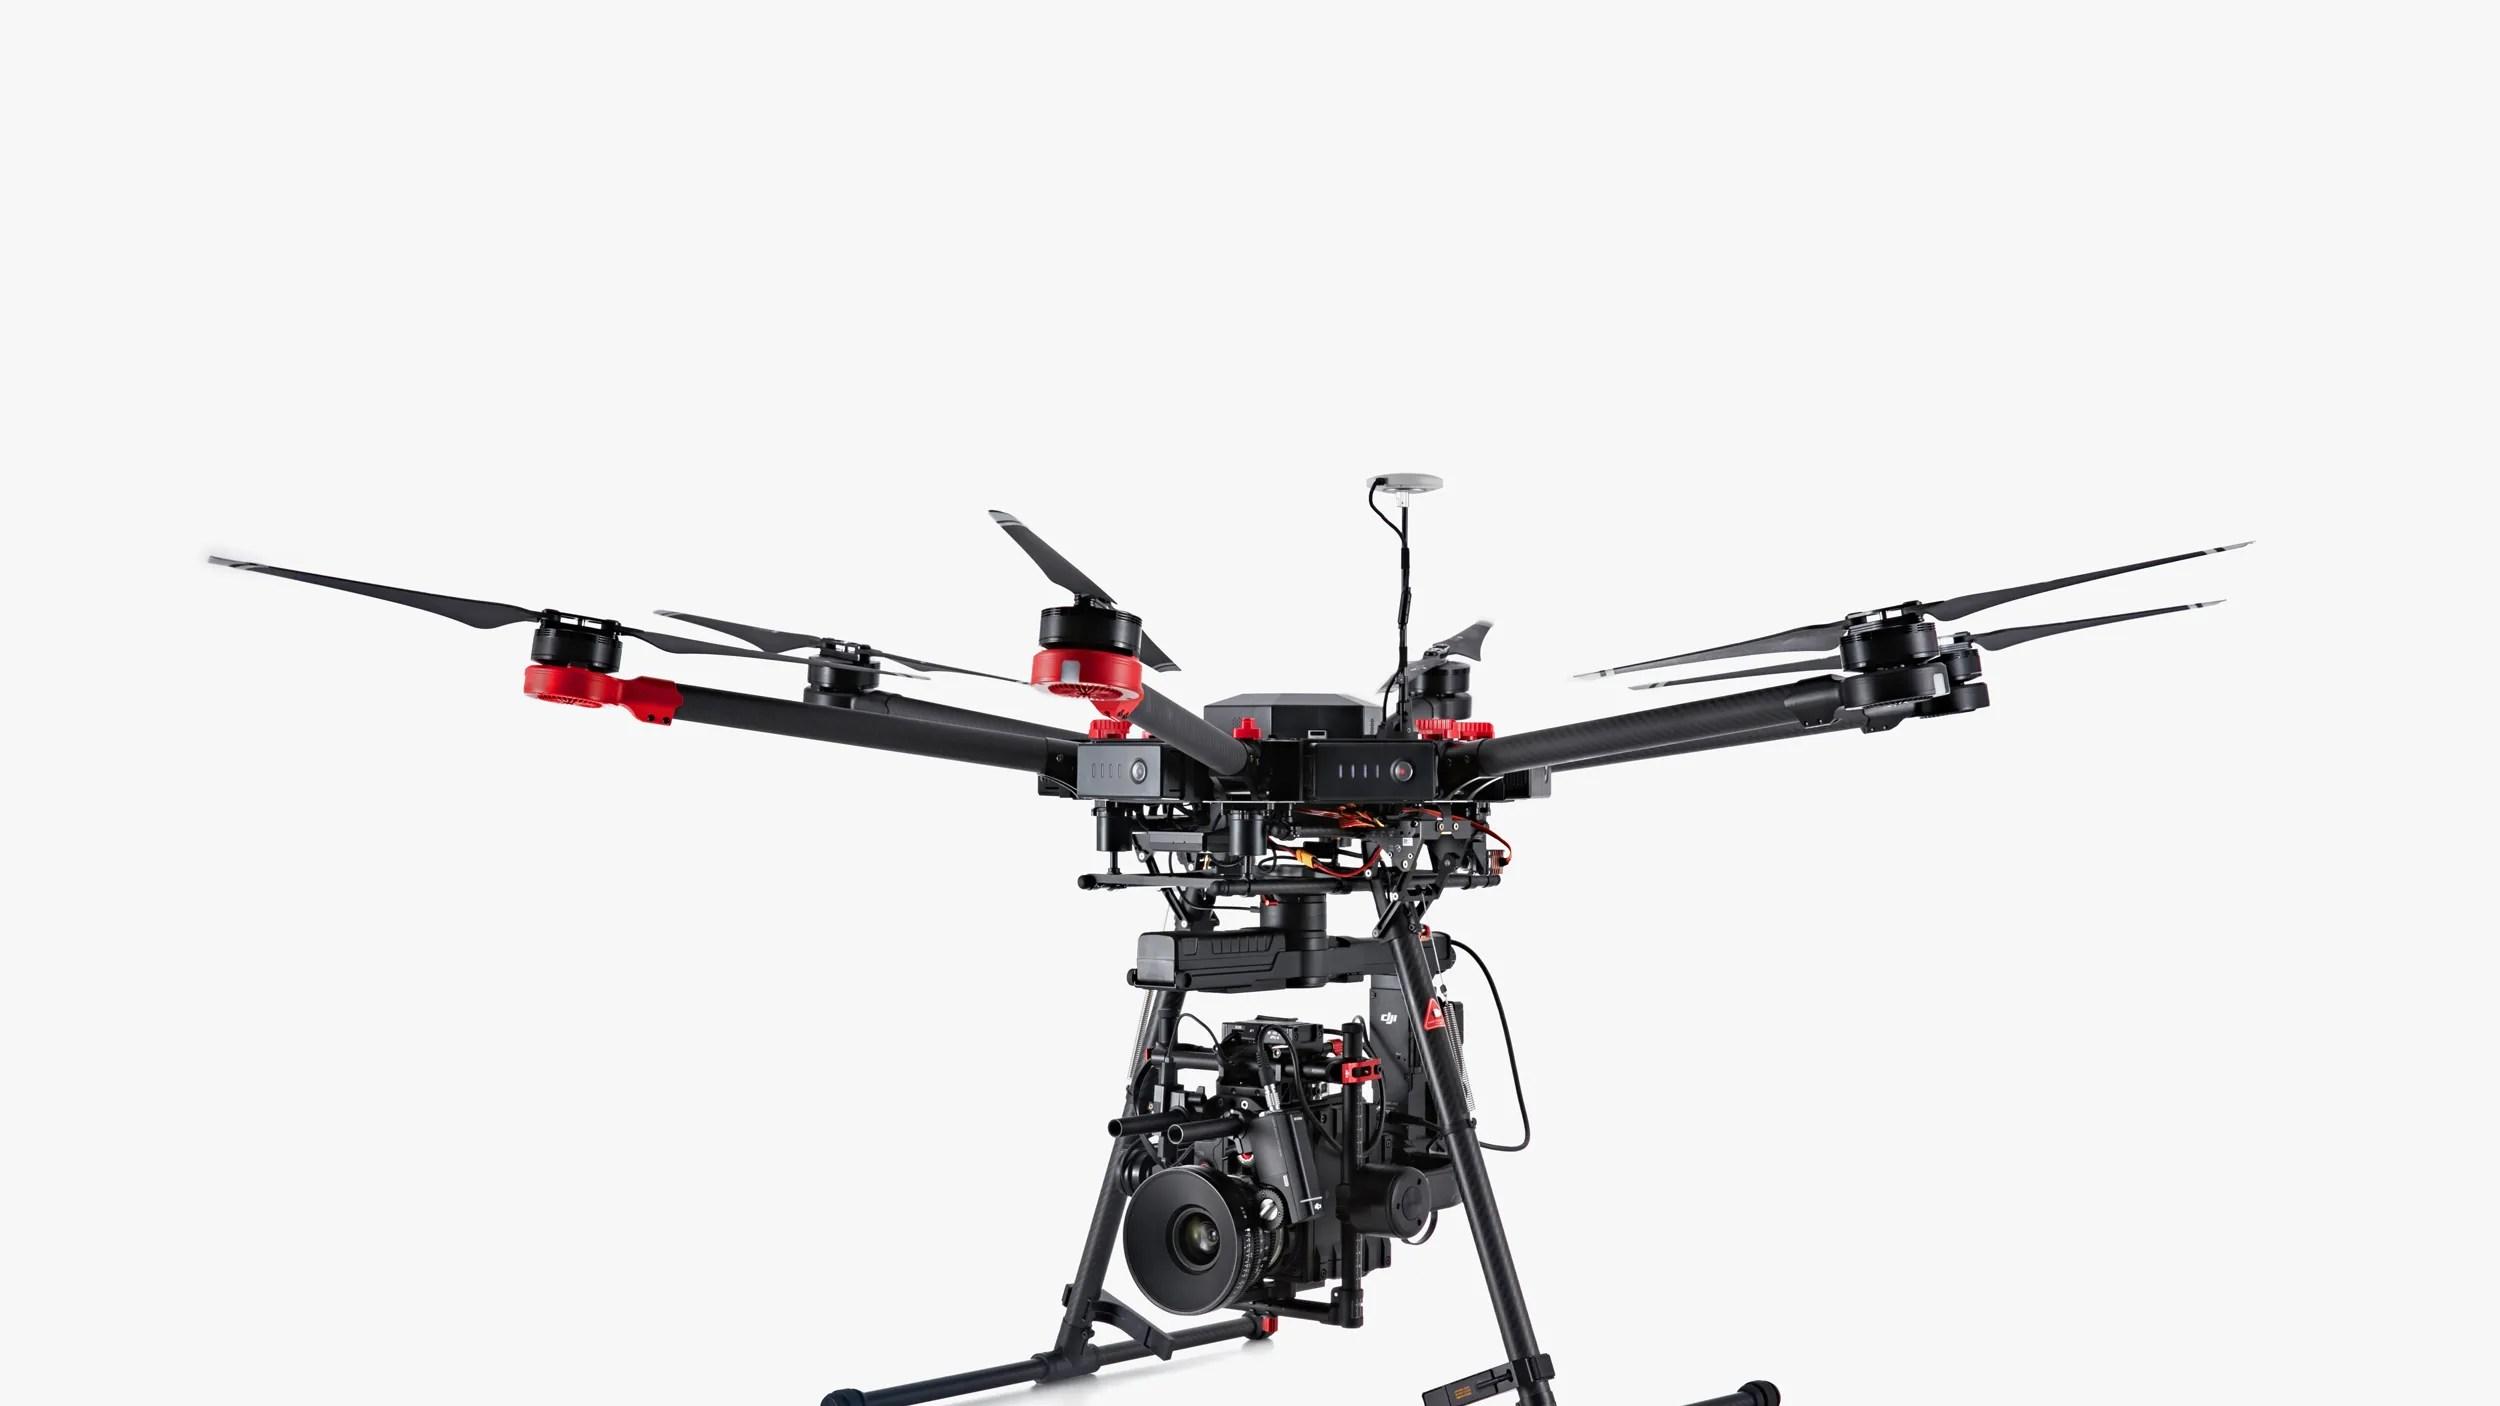 Gear 360 Drone Gimbal